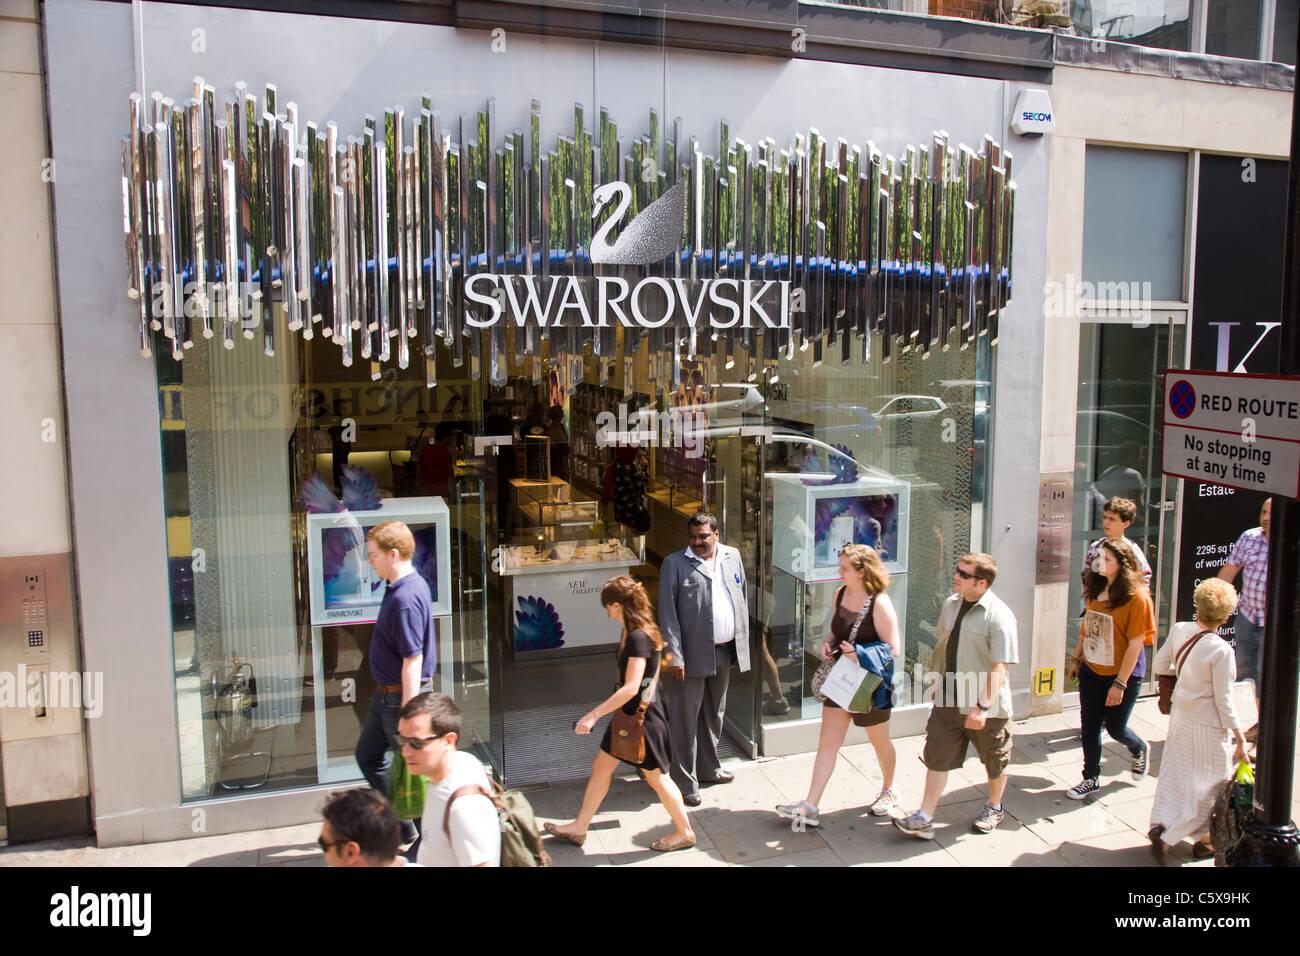 Swarovski crystal retail shop in Kinghtsbridge ebbaa0d82c